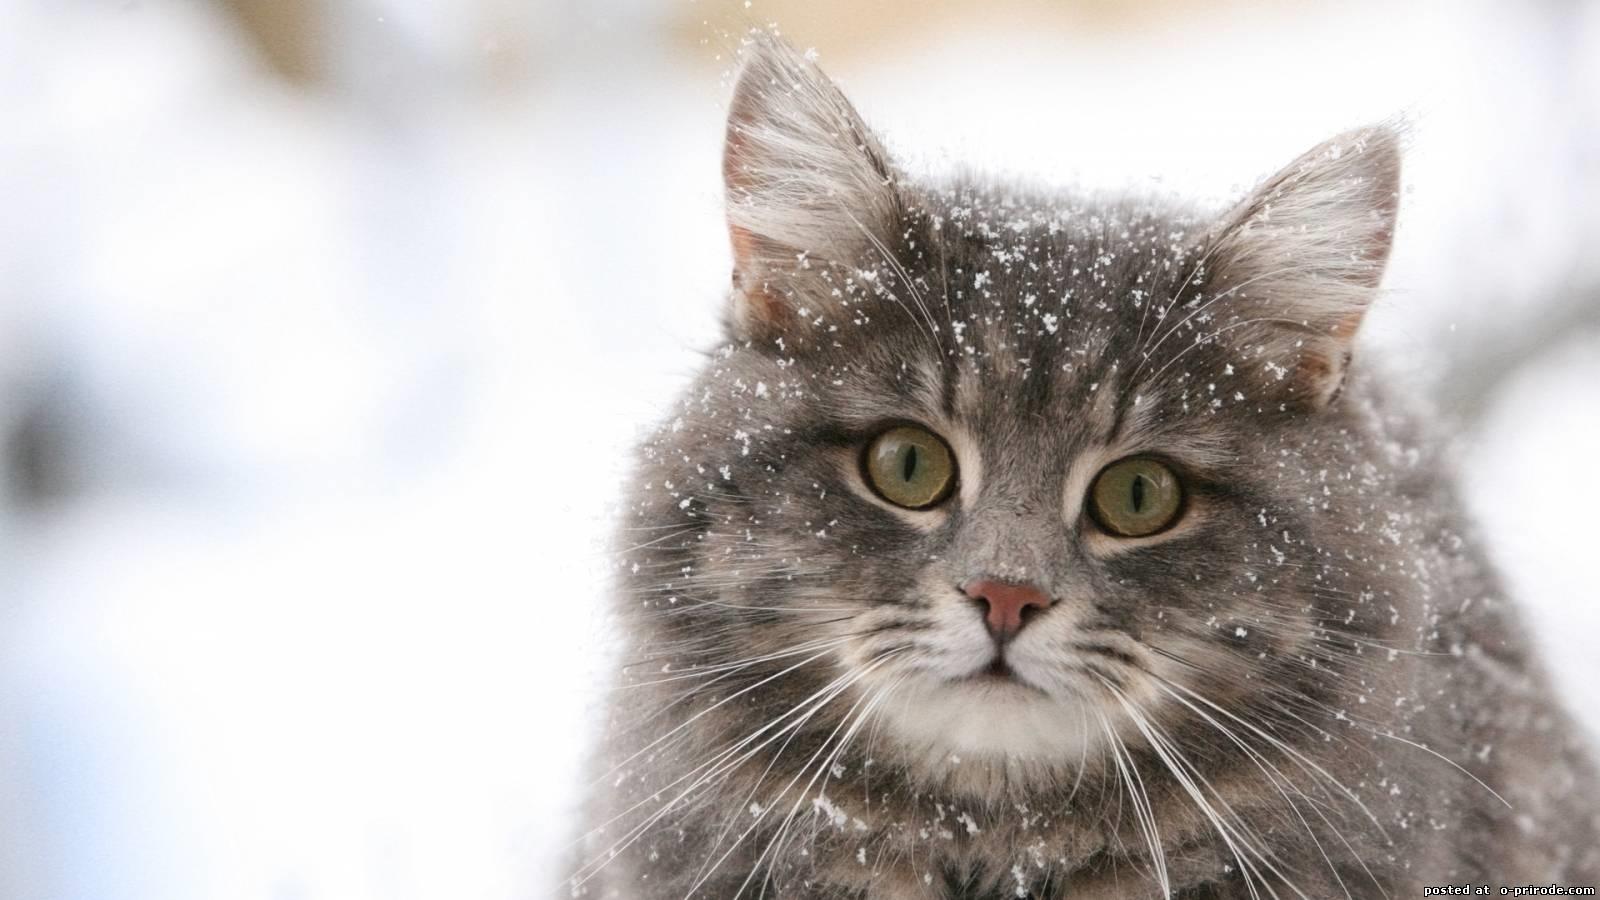 Обои на телефон котята красивые (7)